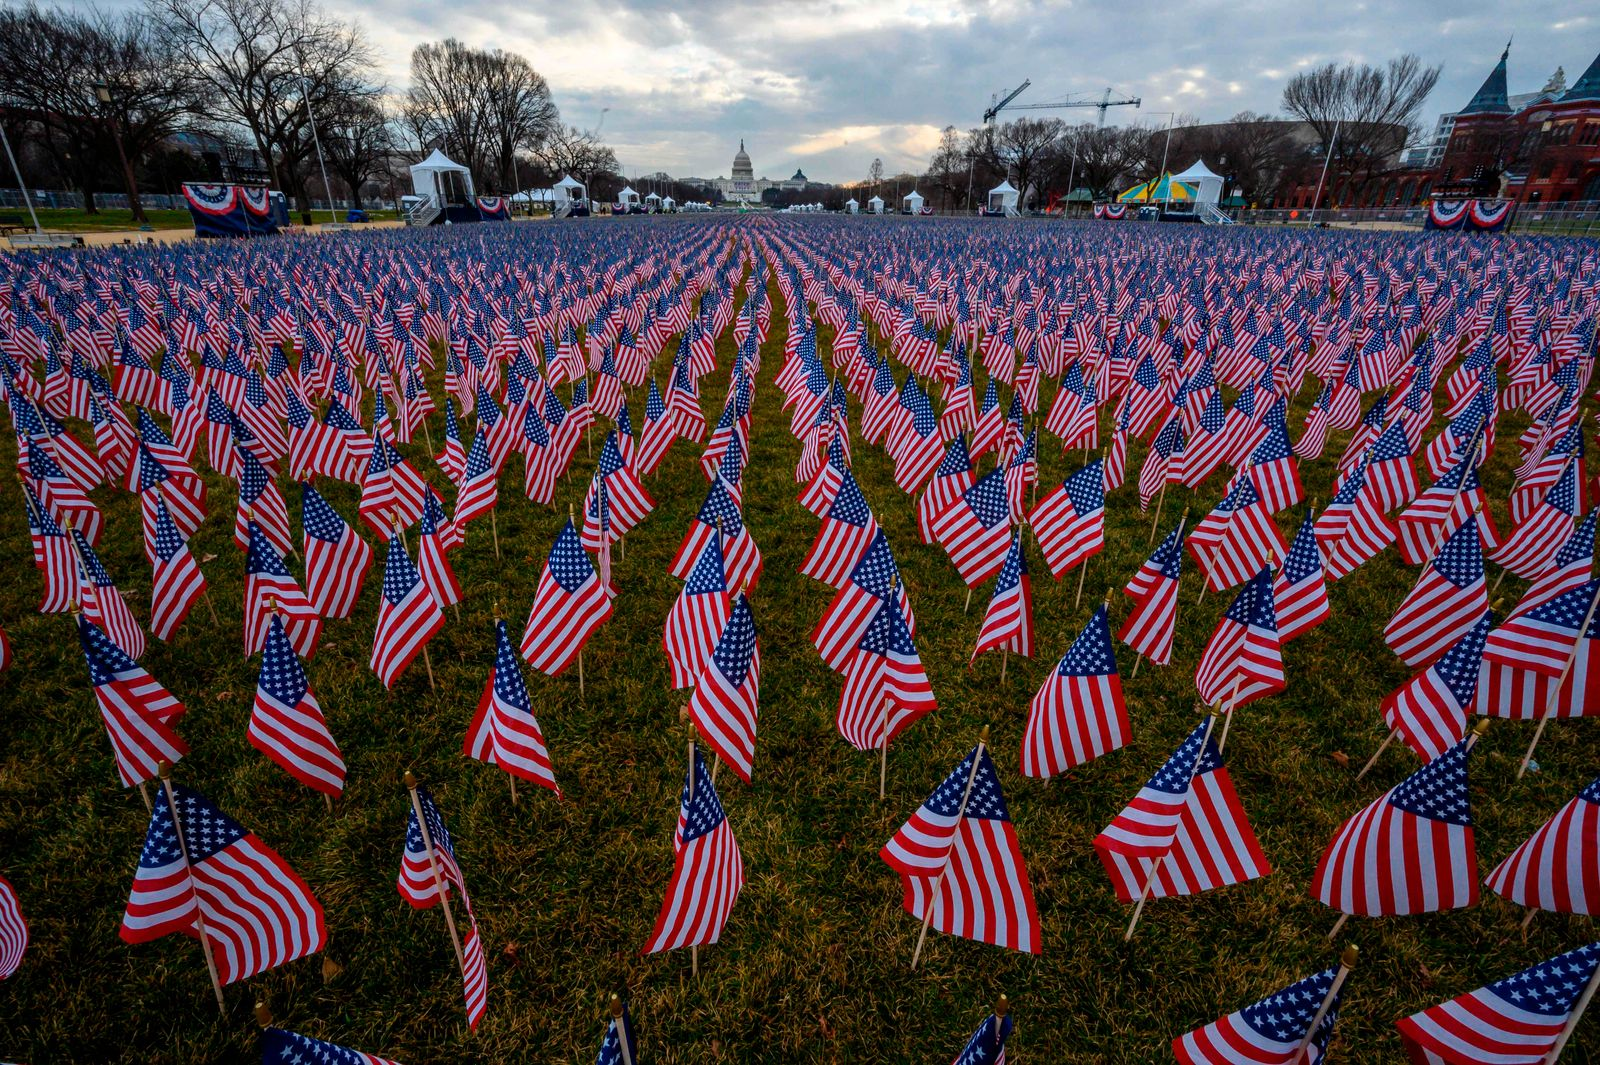 US-POLITICS-INAUGURATION-FLAGS-MALL